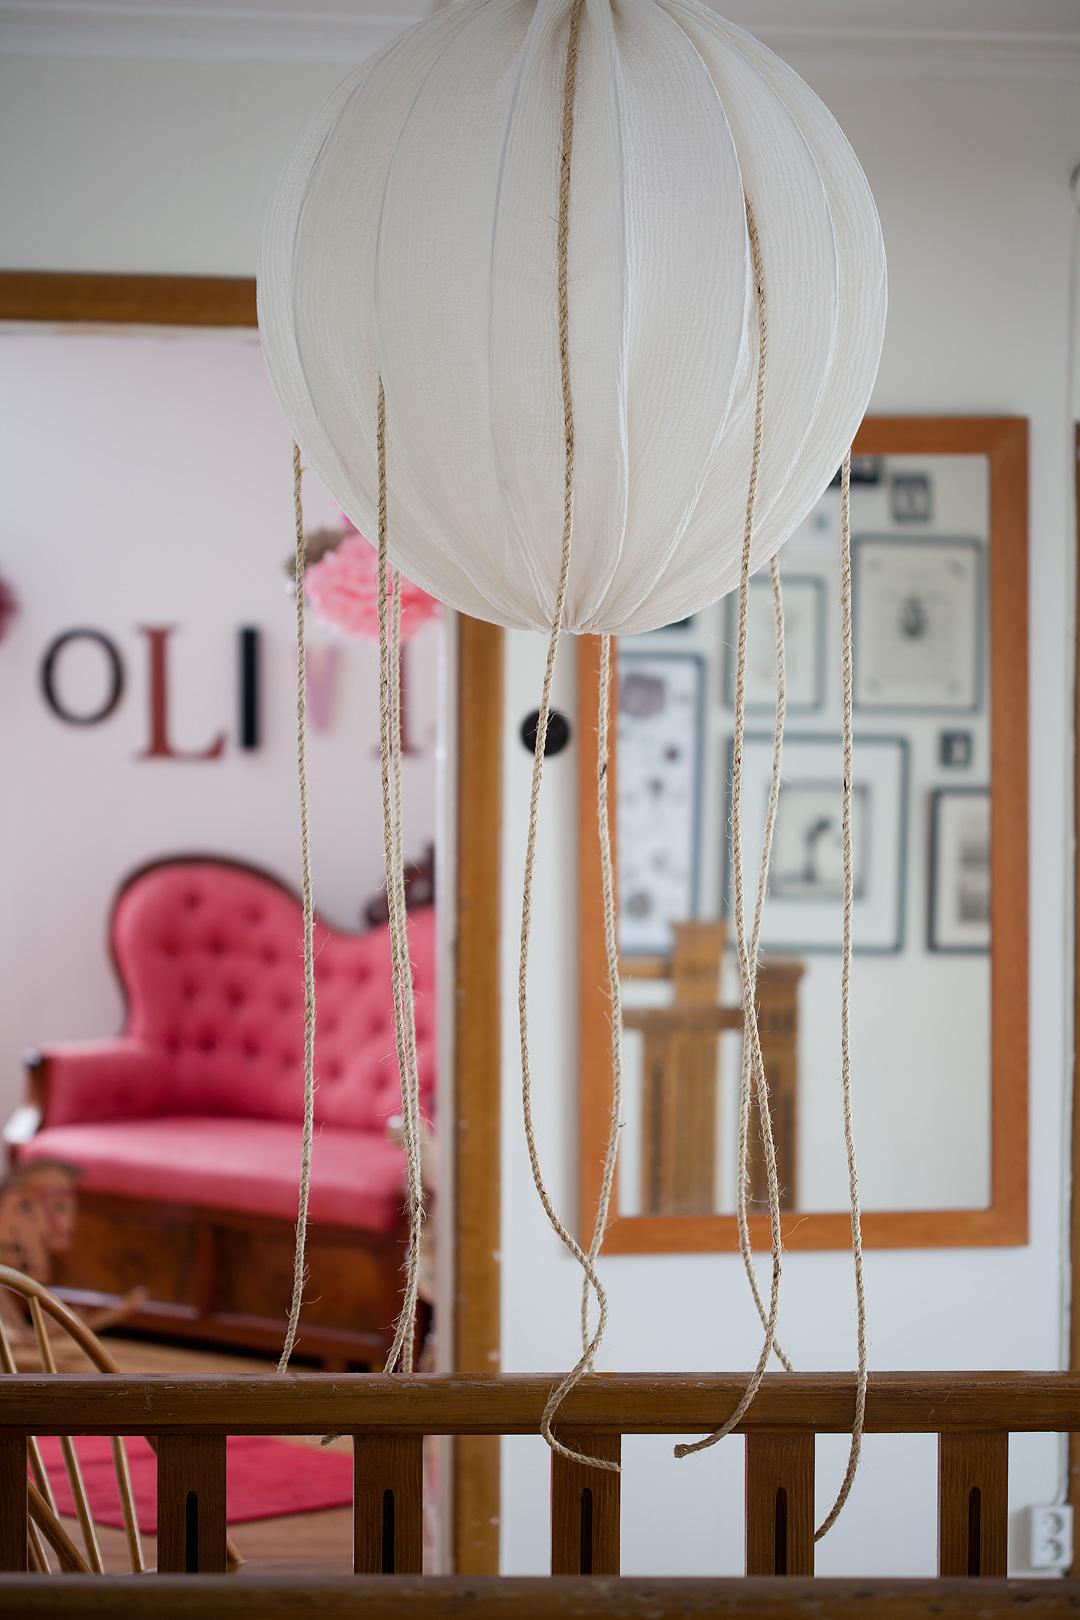 Luftballong1©Anna-Lefvert